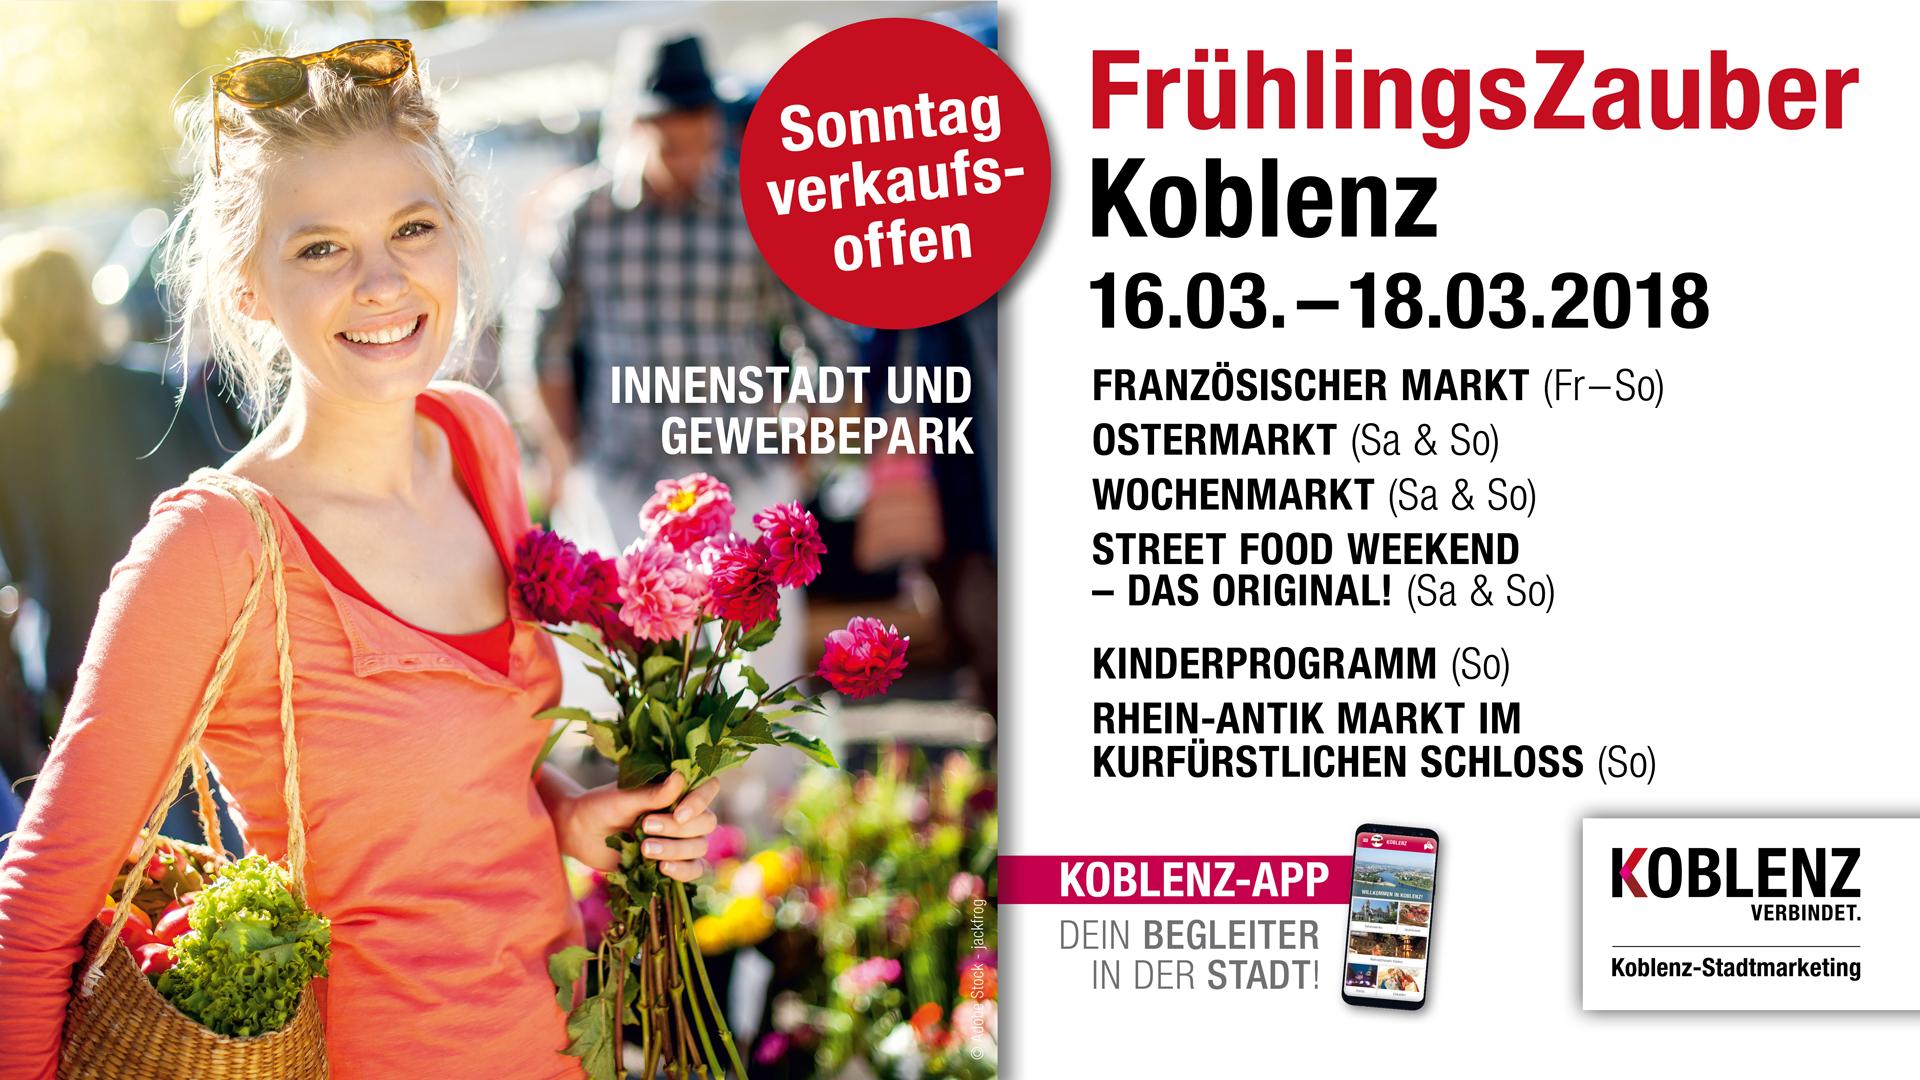 Fruhlingszauber In Koblenz Koblenz Stadtmarketing